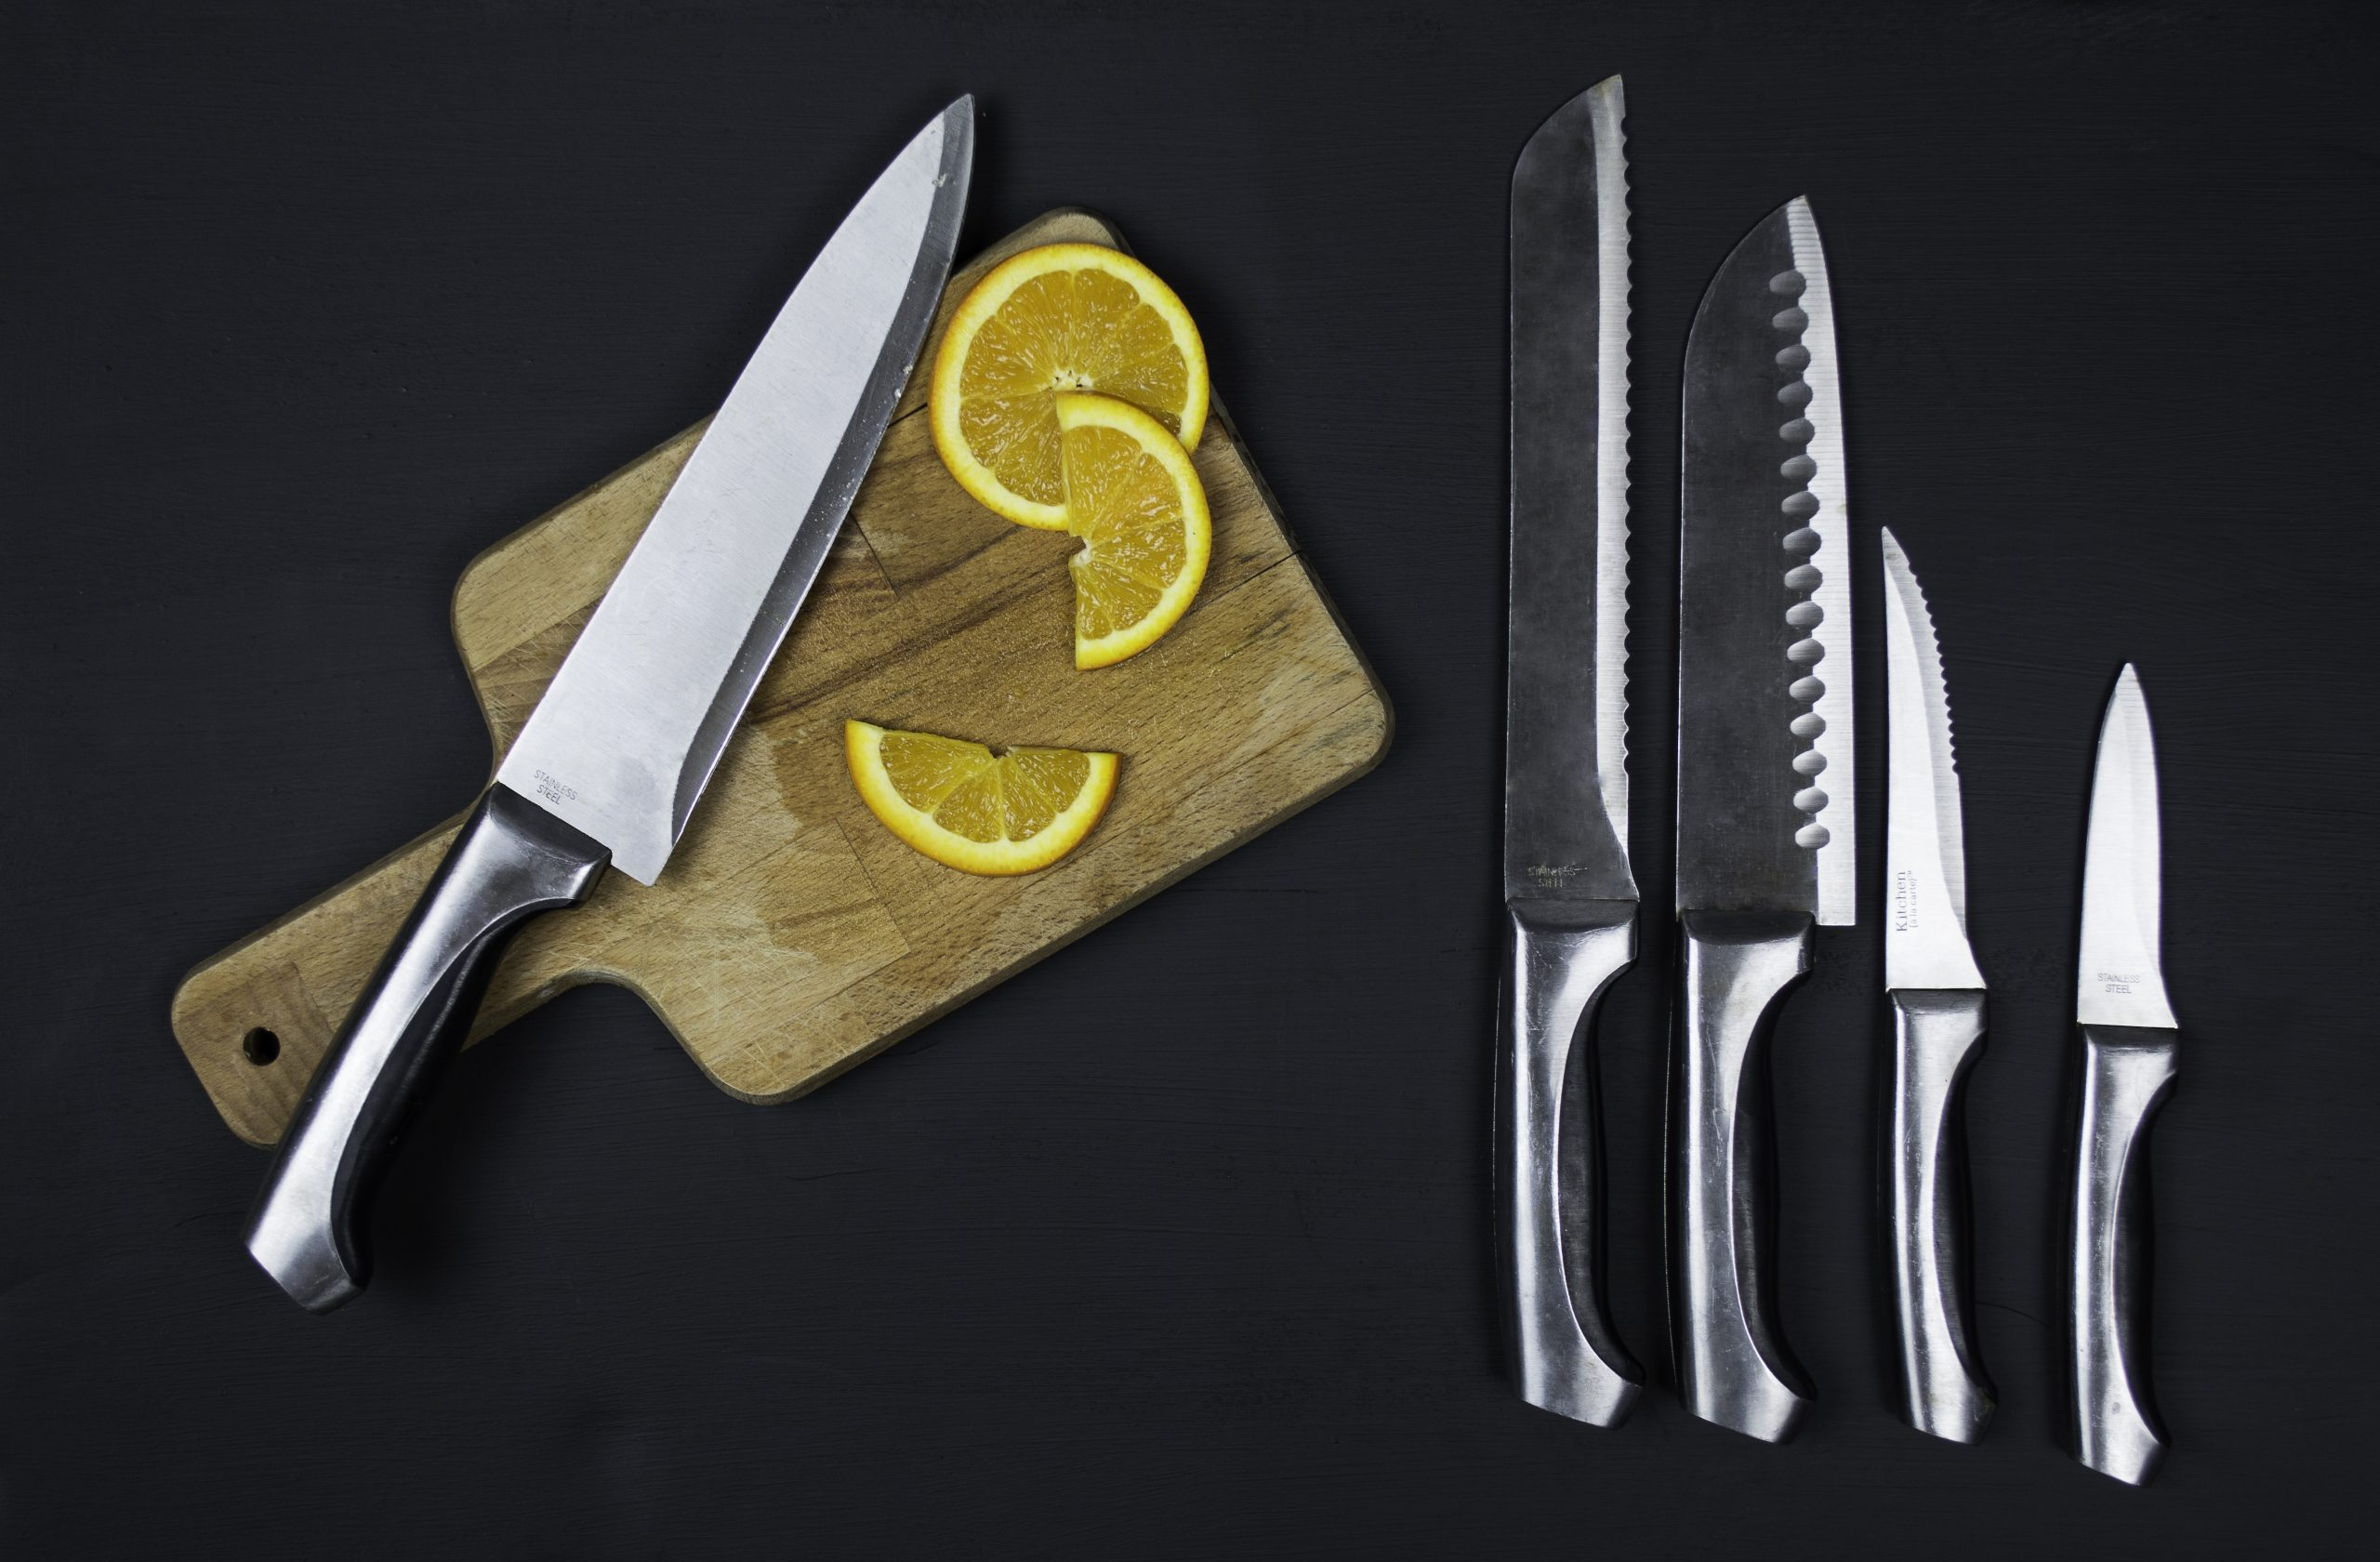 Knife Skills - Abinger Cookery School